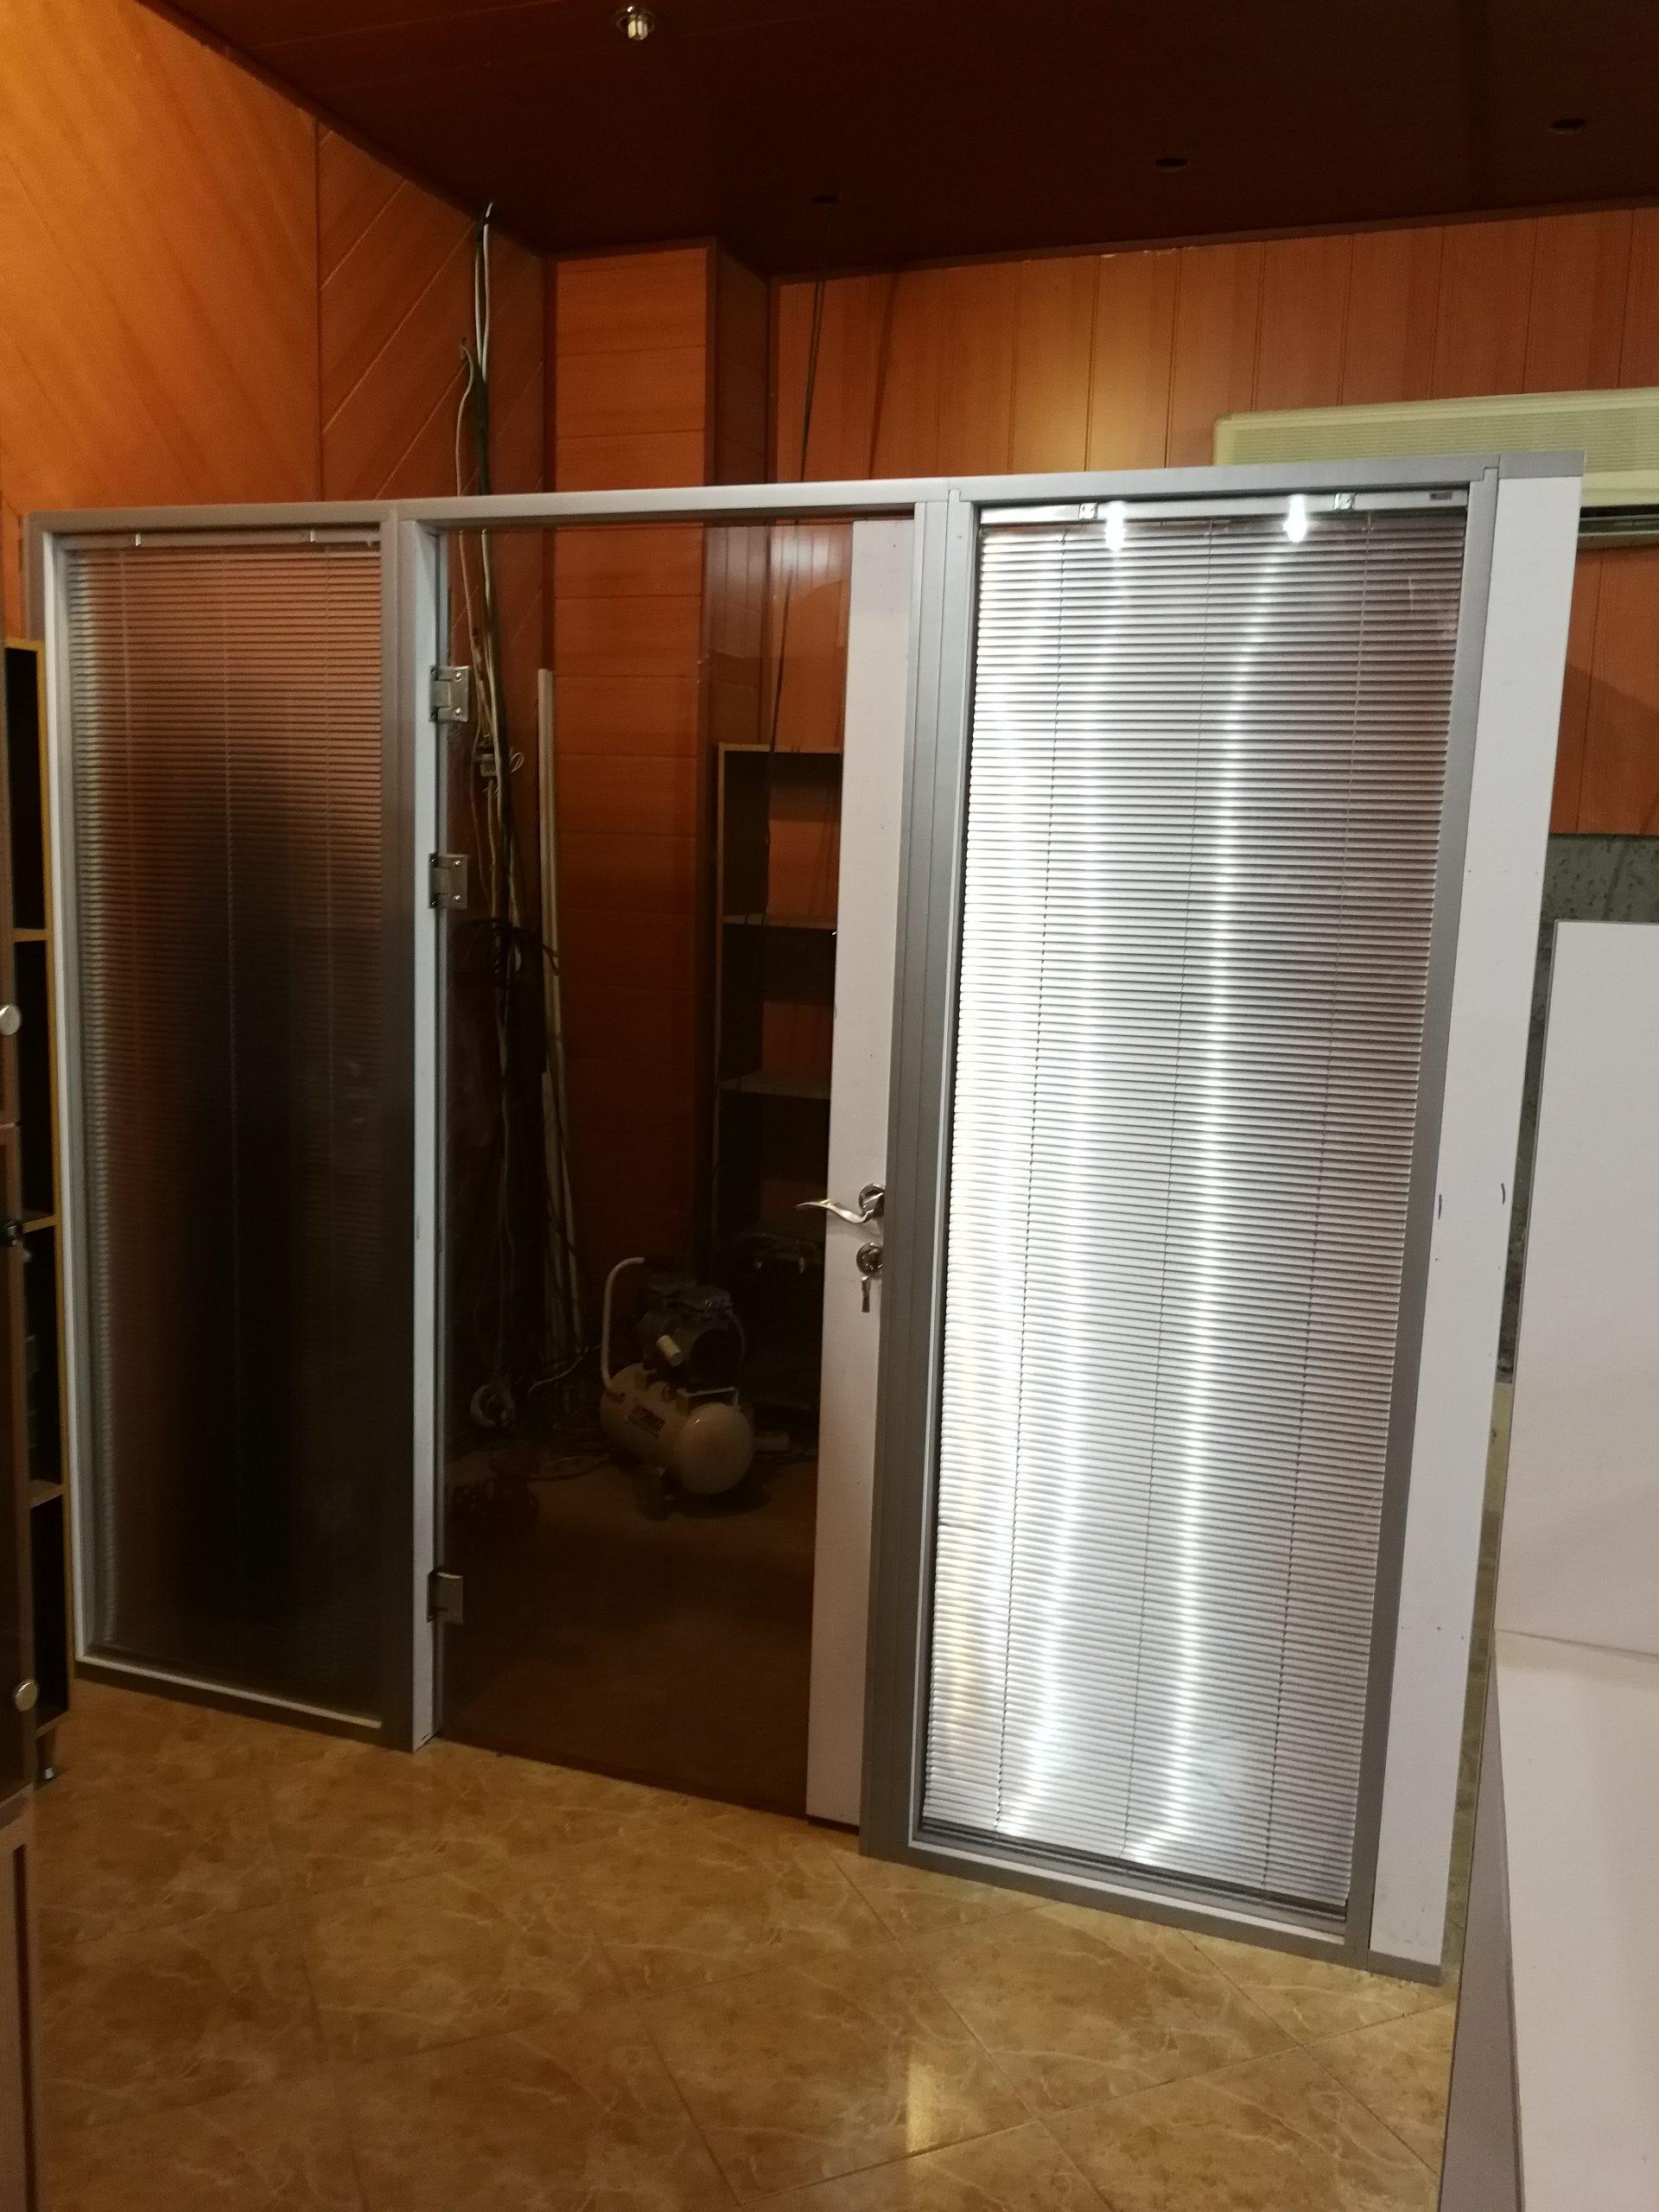 ام دی اف تمام شیشه K200 9 scaled - پارتیشن ام دی اف اداری